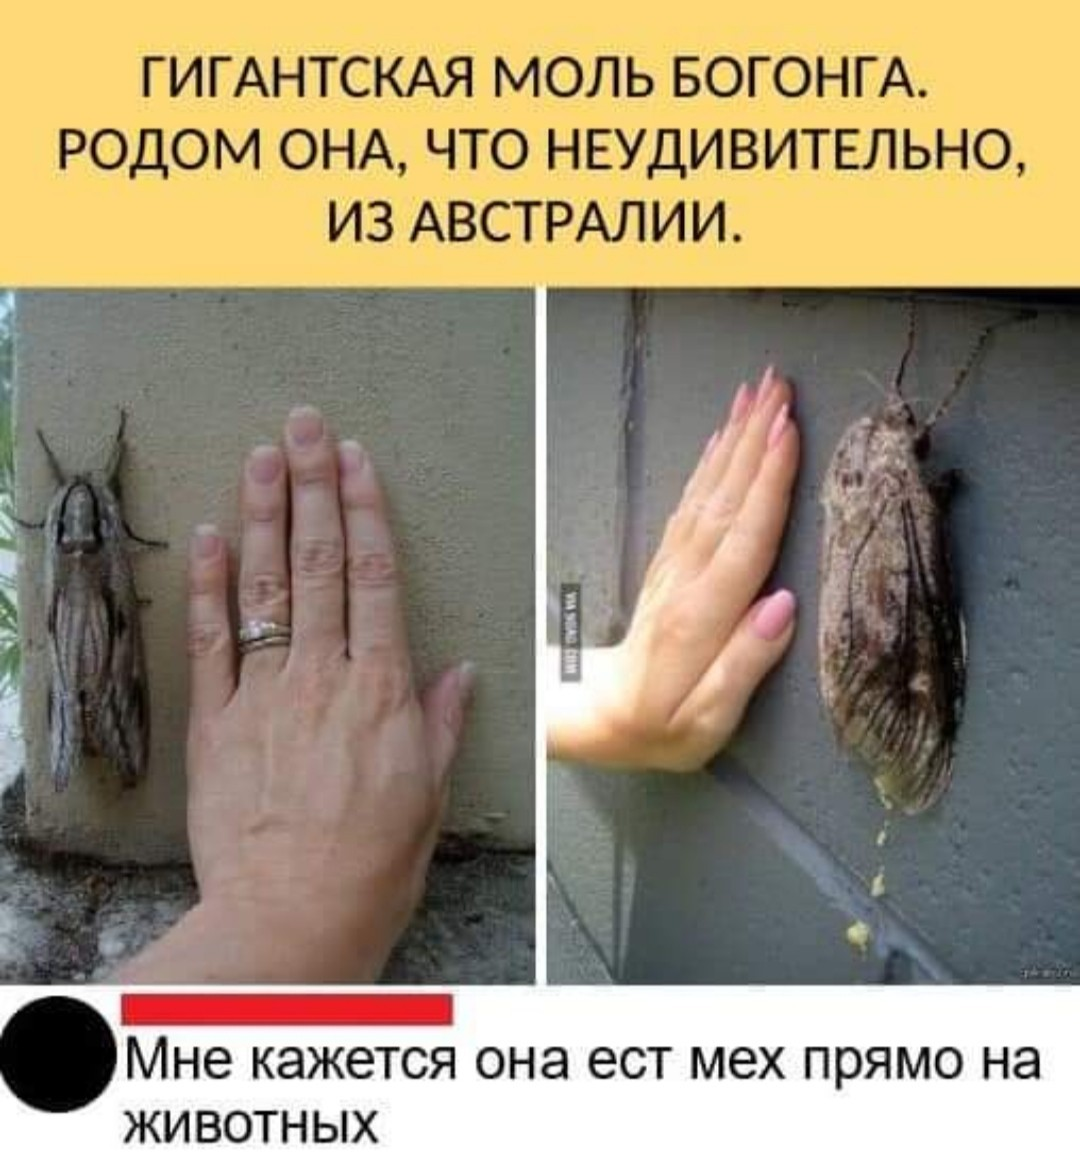 https://s00.yaplakal.com/pics/pics_original/8/2/1/14351128.jpg